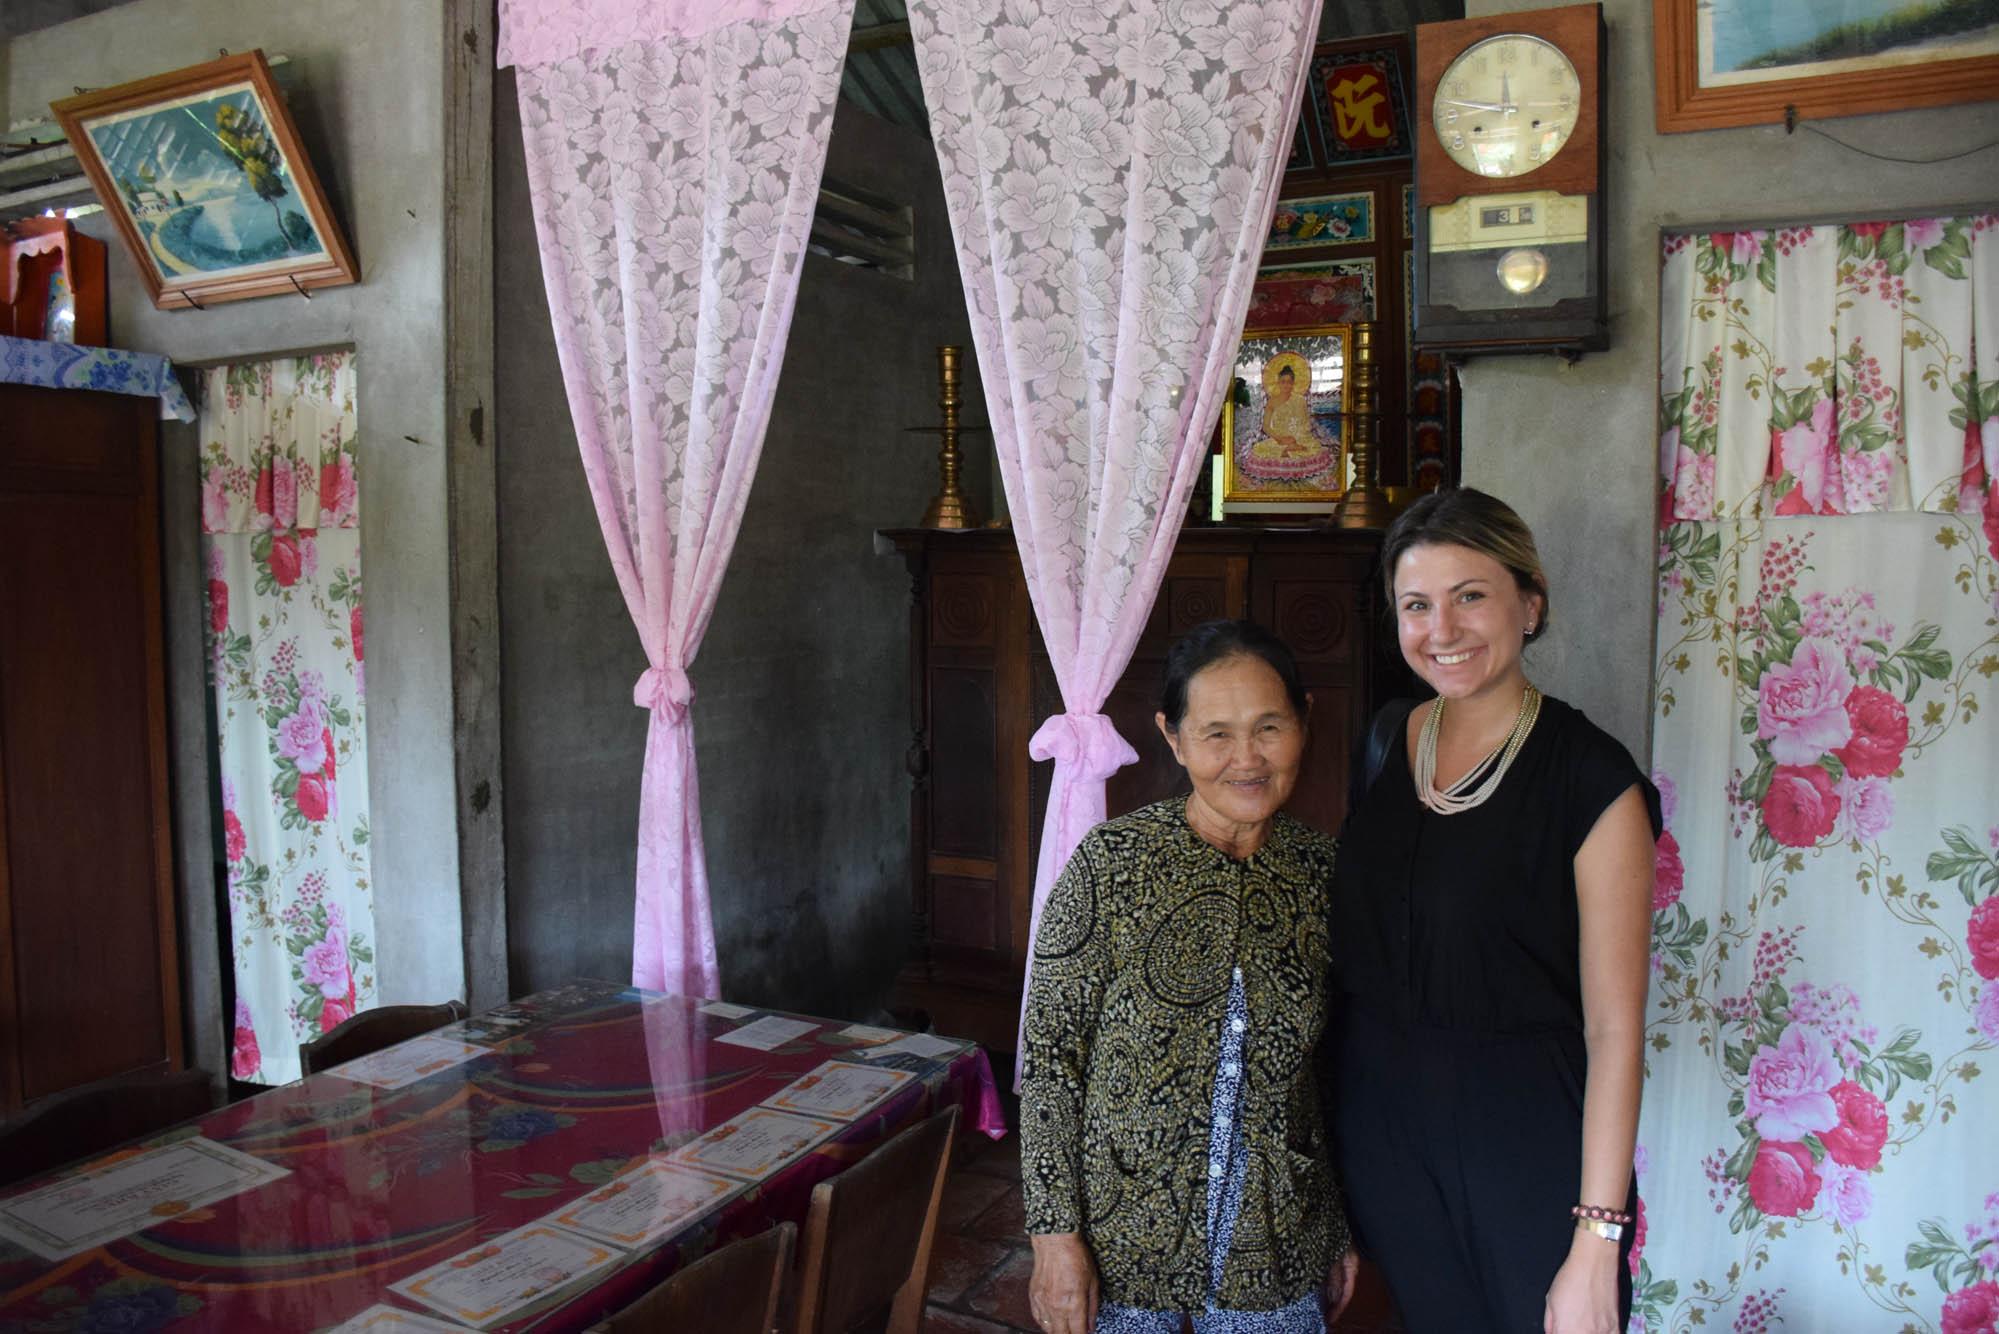 mekong-delta-rio-cai-be-floating-market-ho-chi-minh-city-saigon-roteiro-vietna